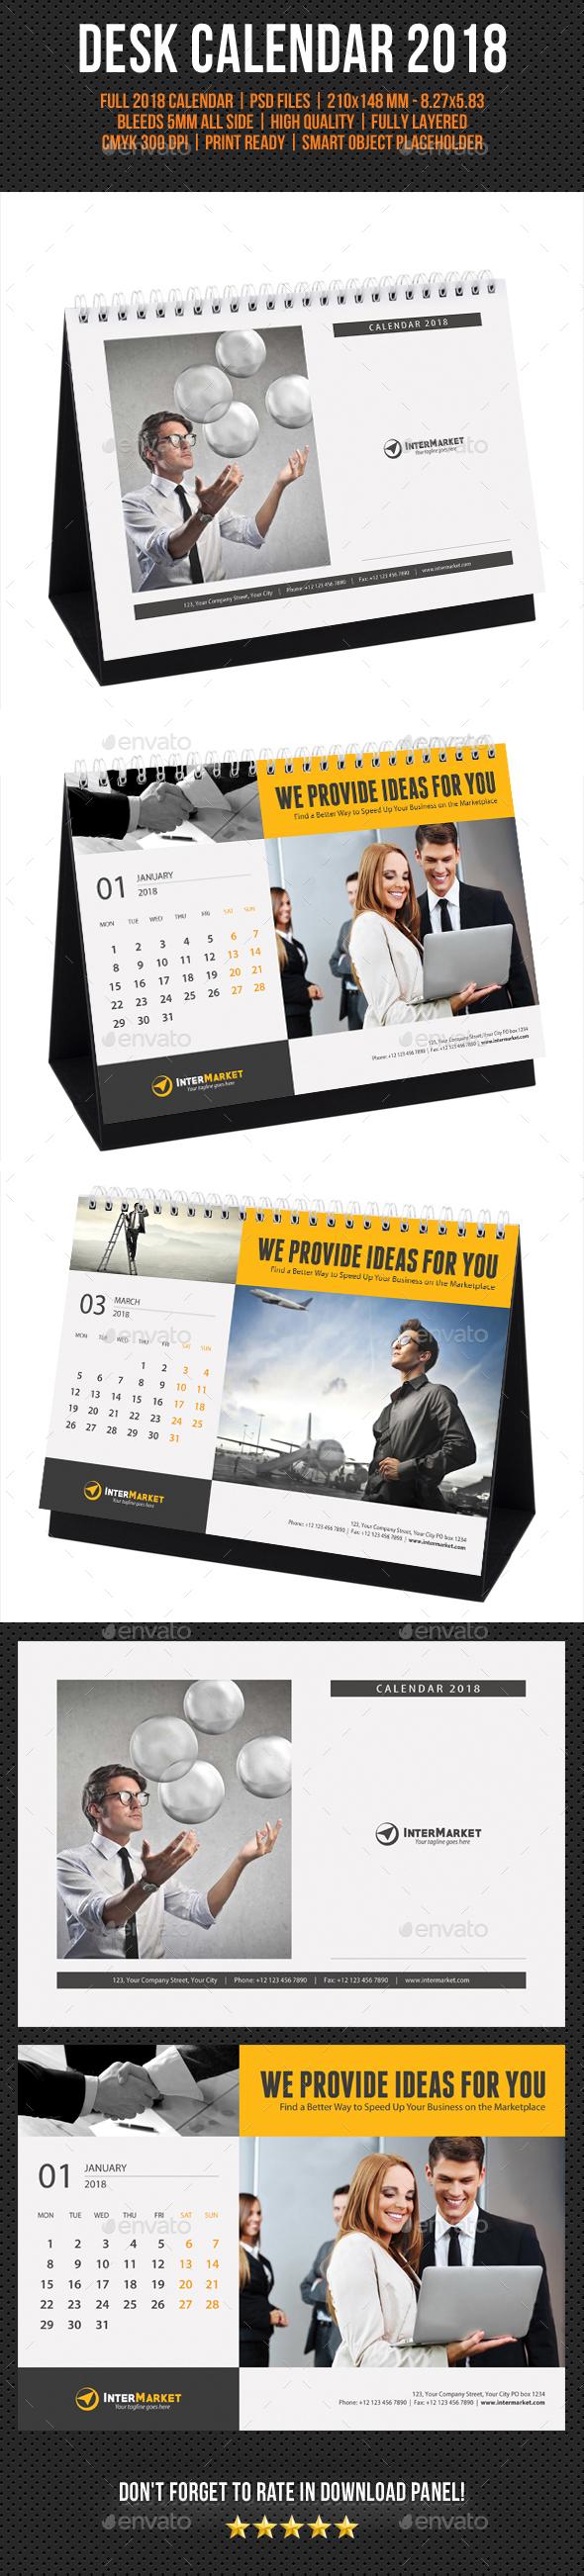 Corporate Desk Calendar 2018 - Calendars Stationery